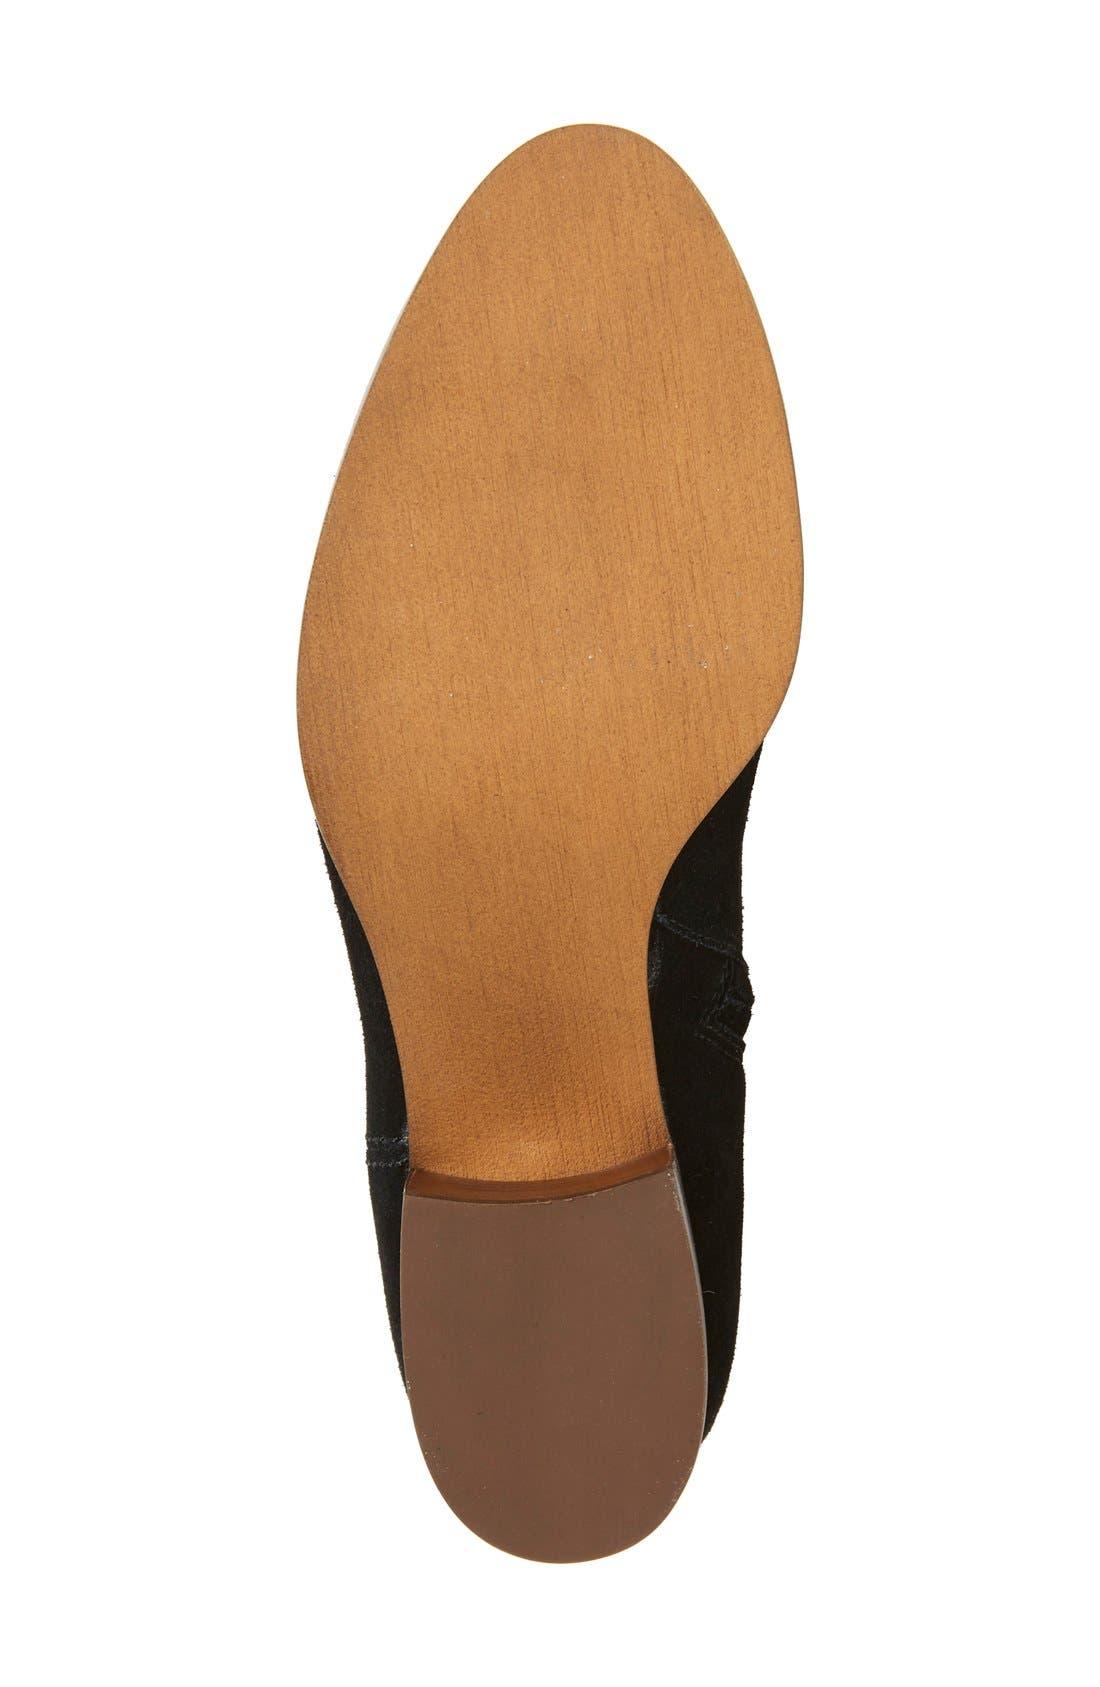 Tessie Tall Boot,                             Alternate thumbnail 4, color,                             001